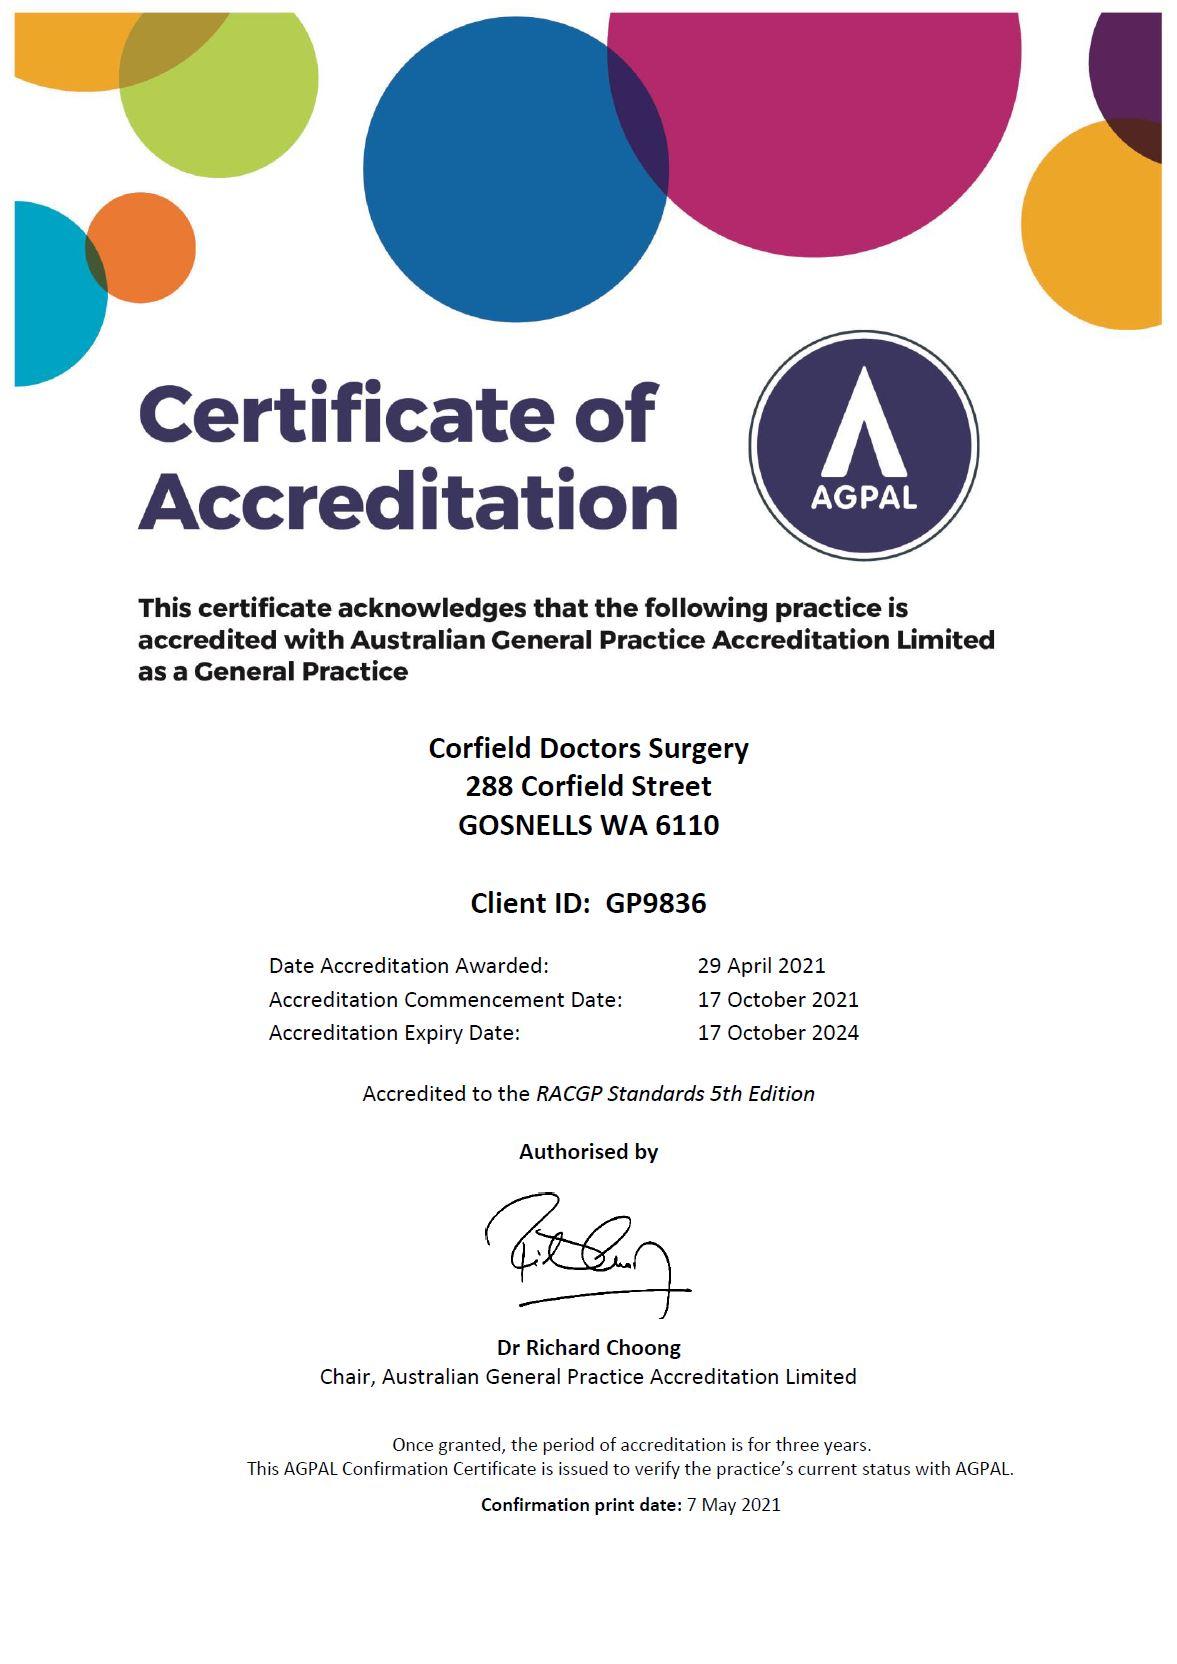 Accreditation Certificate CDS